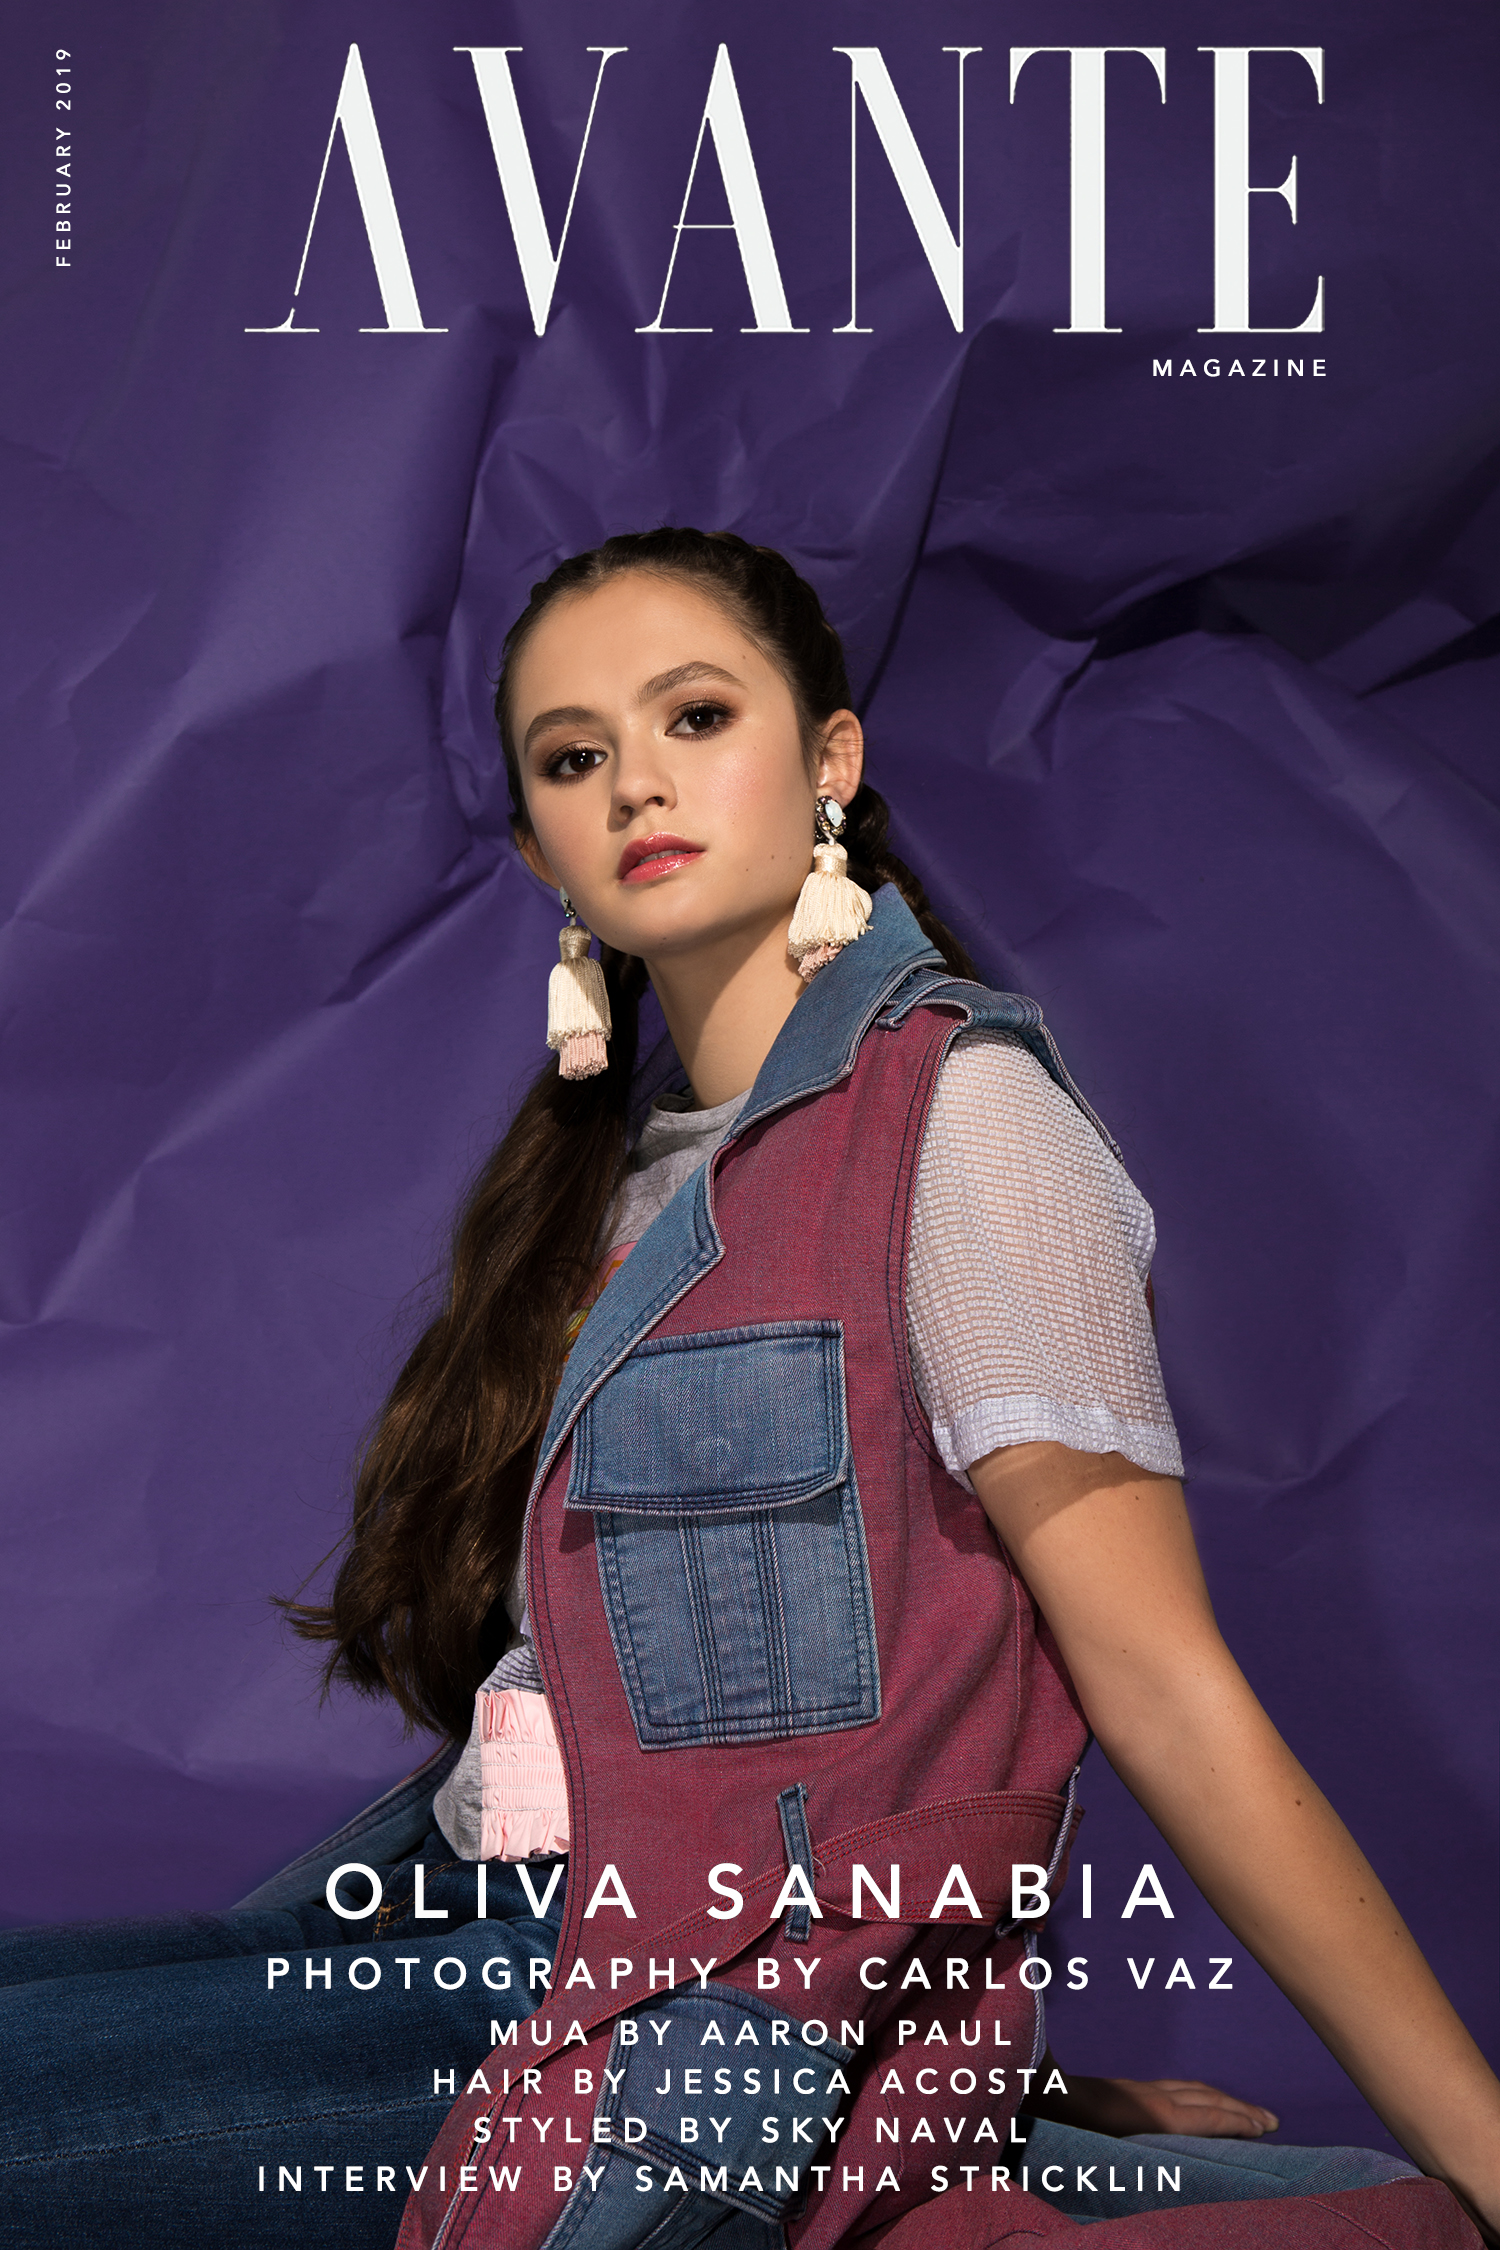 Olivia Sanabia 1500 Cover.jpg